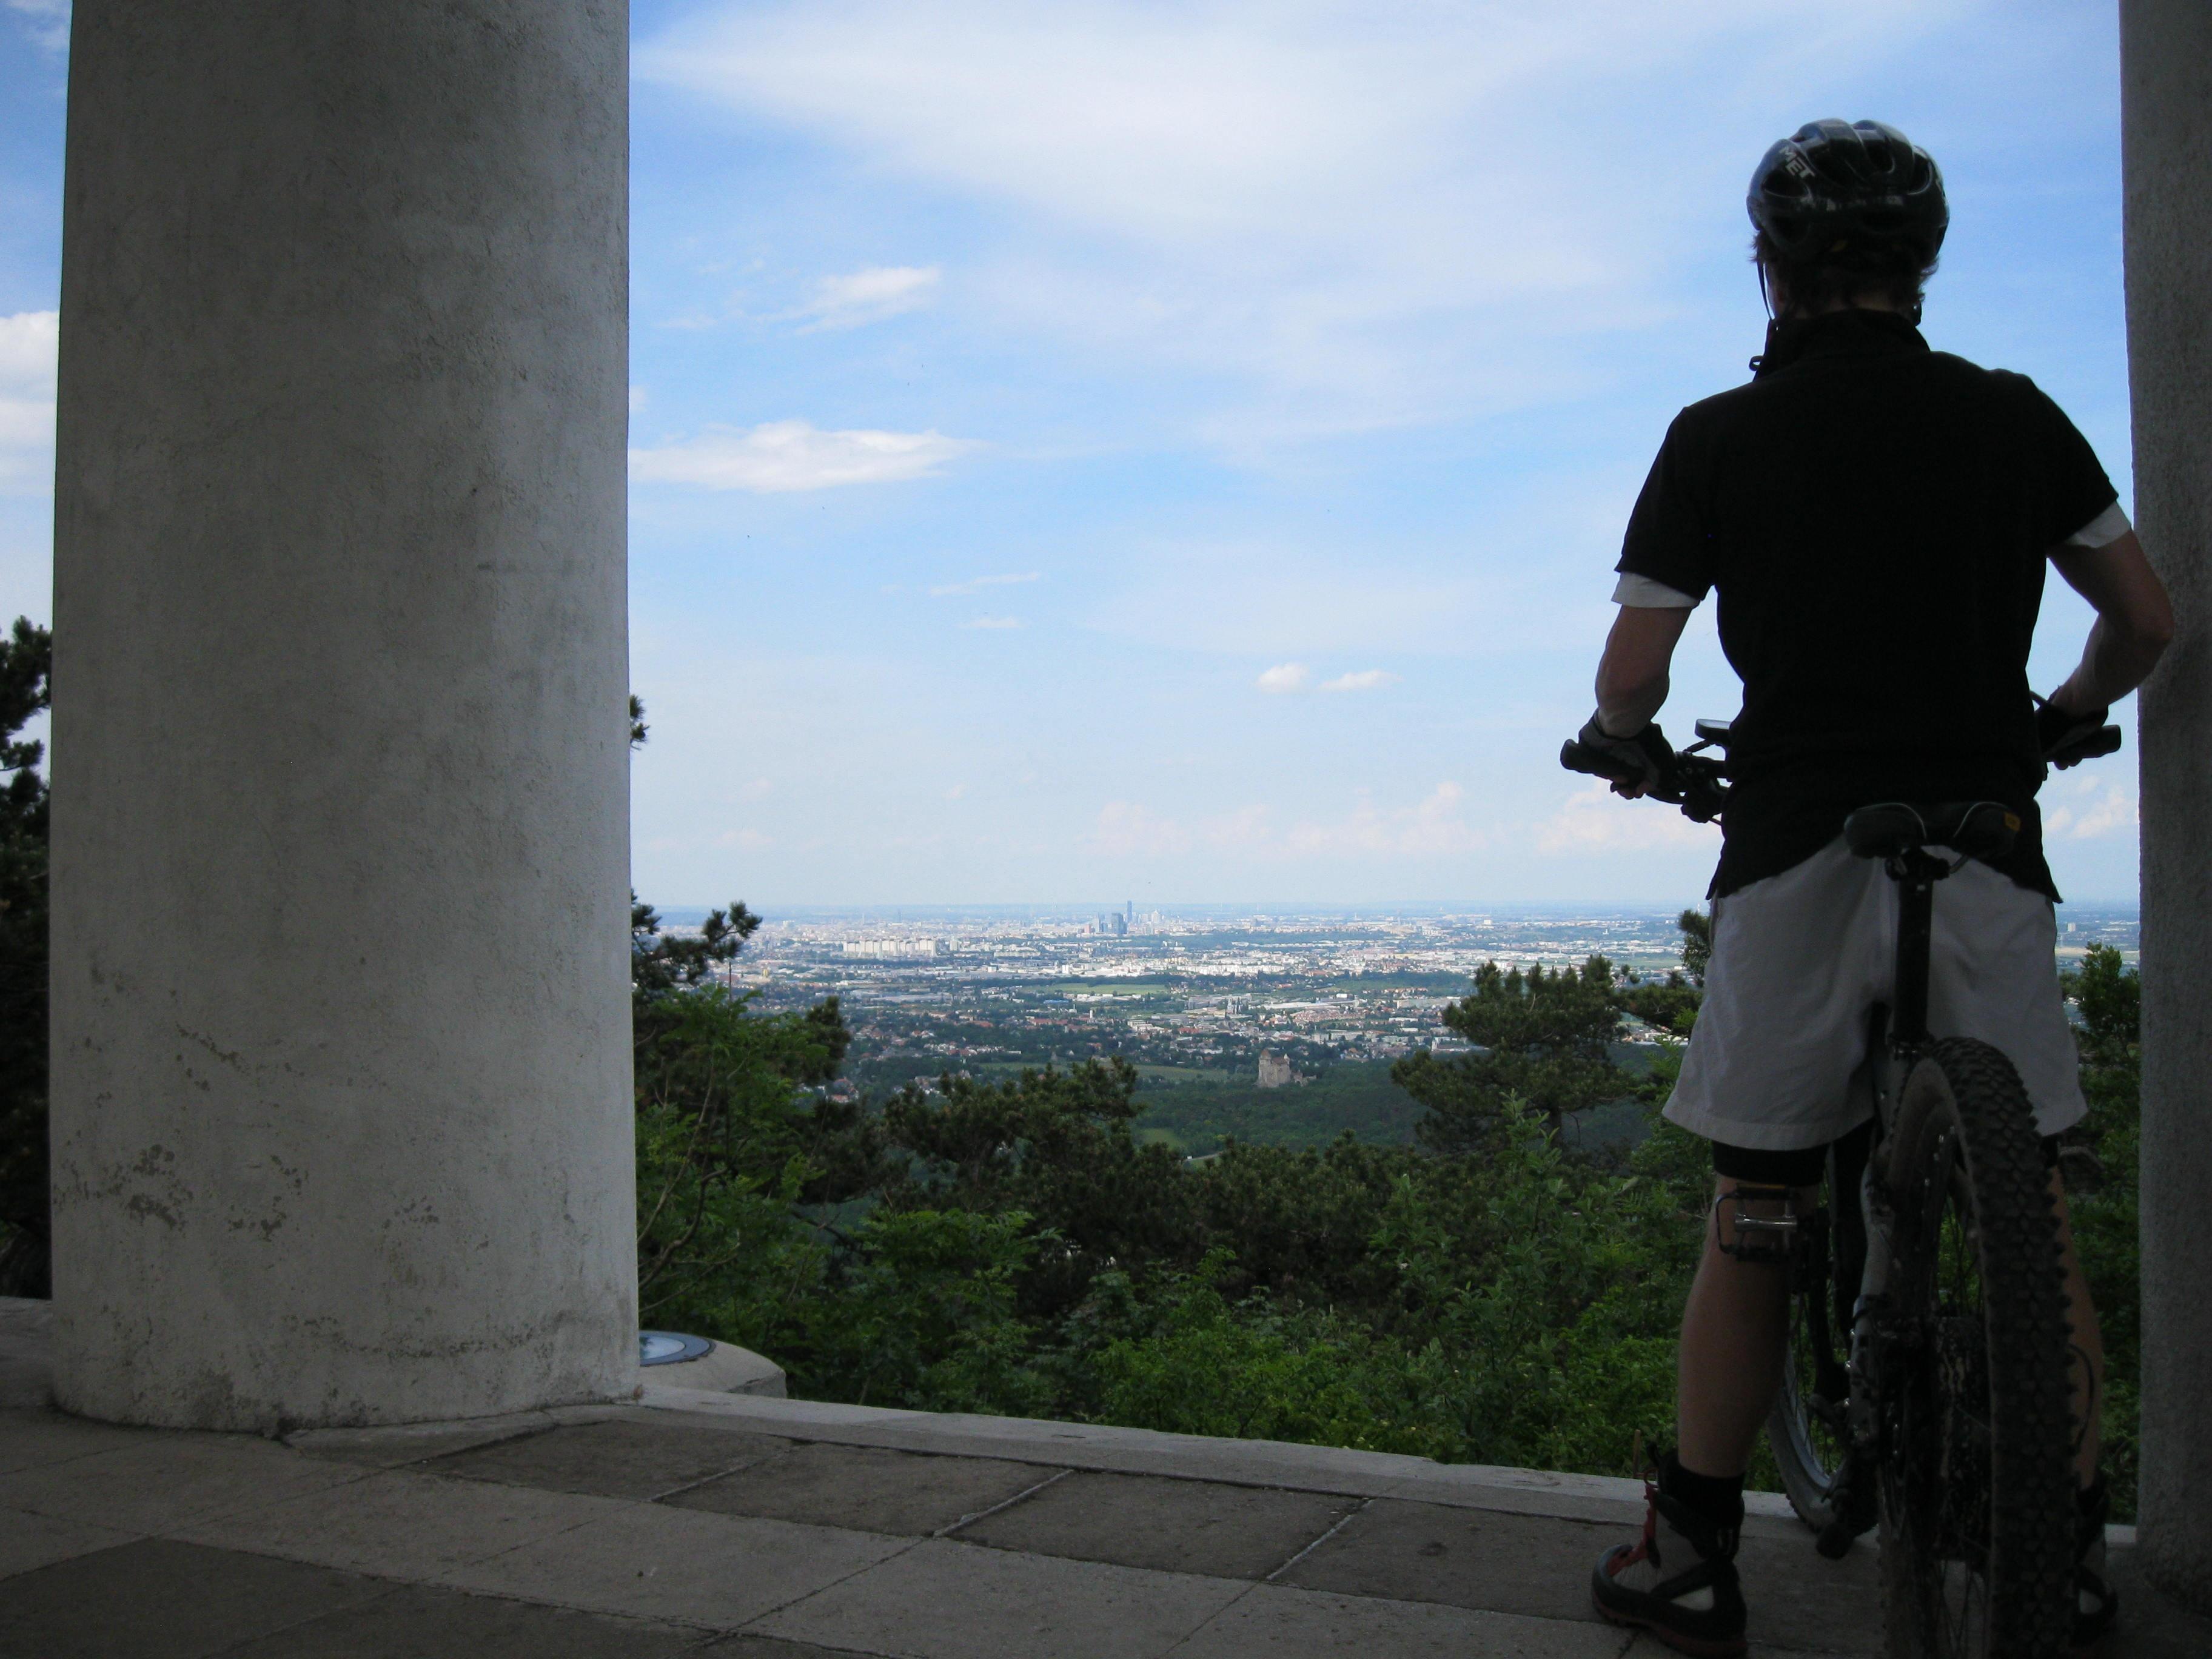 Mountainbike Husarentempel Am Kleinen Anninger 33km Bergwelten Expedition E 6730 M Black Grey Alle Fotos Anzeigen